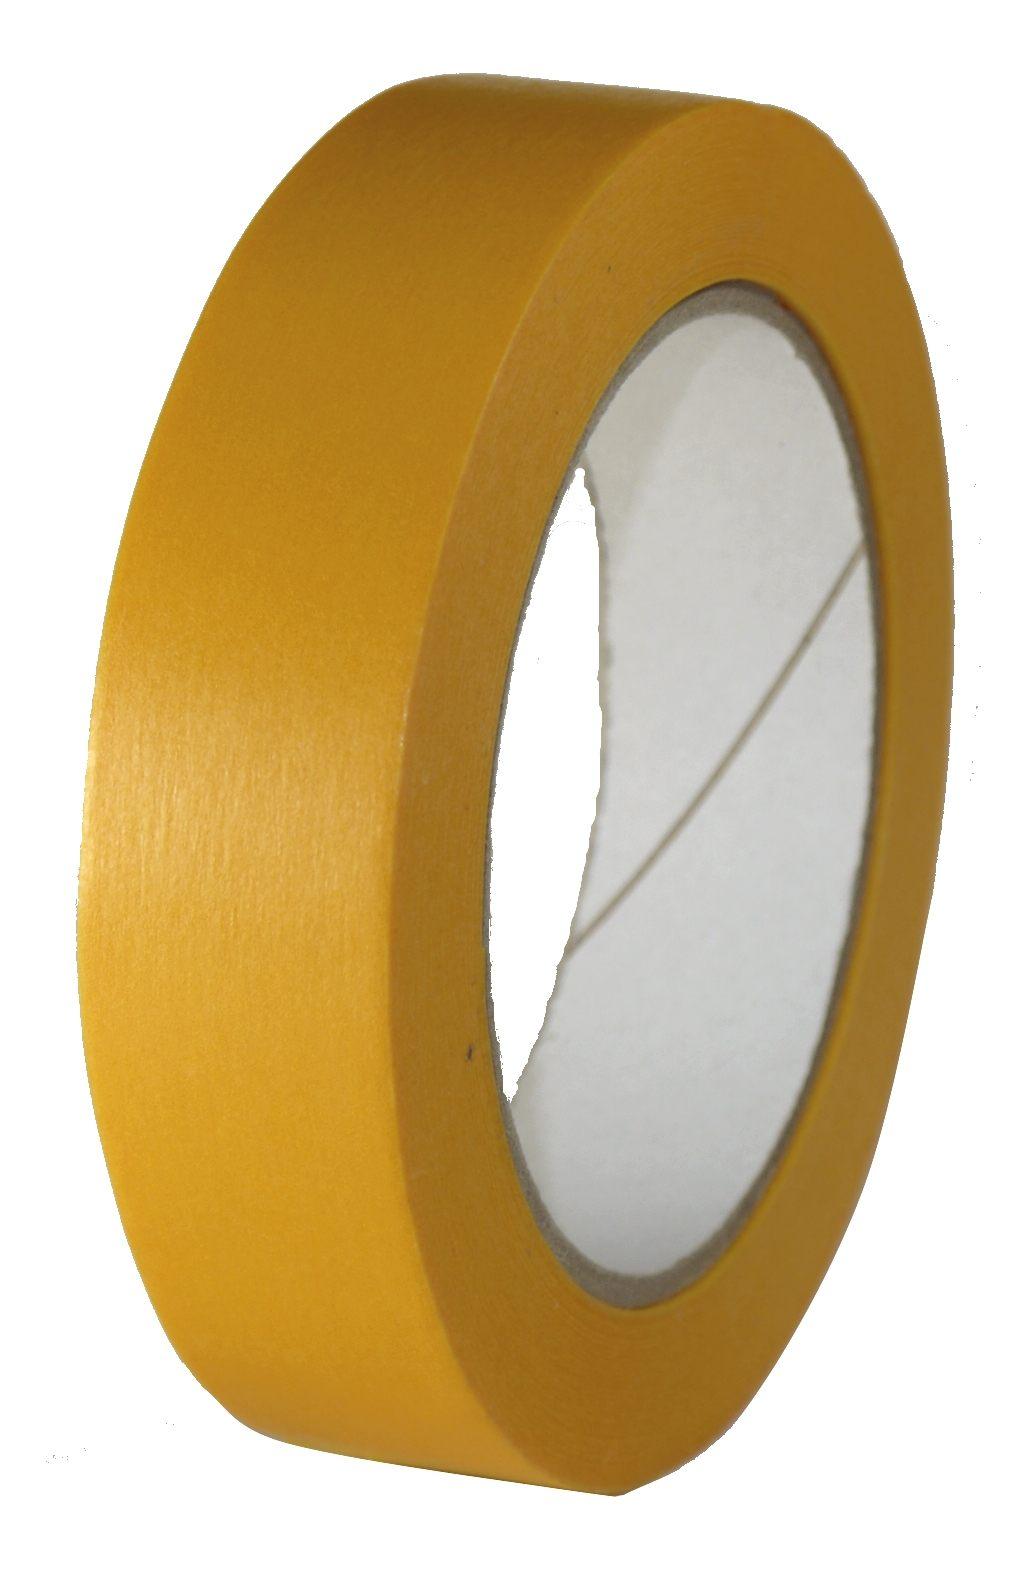 Lackierband Universal Gold/Orange 25mm/50m bis 100°C